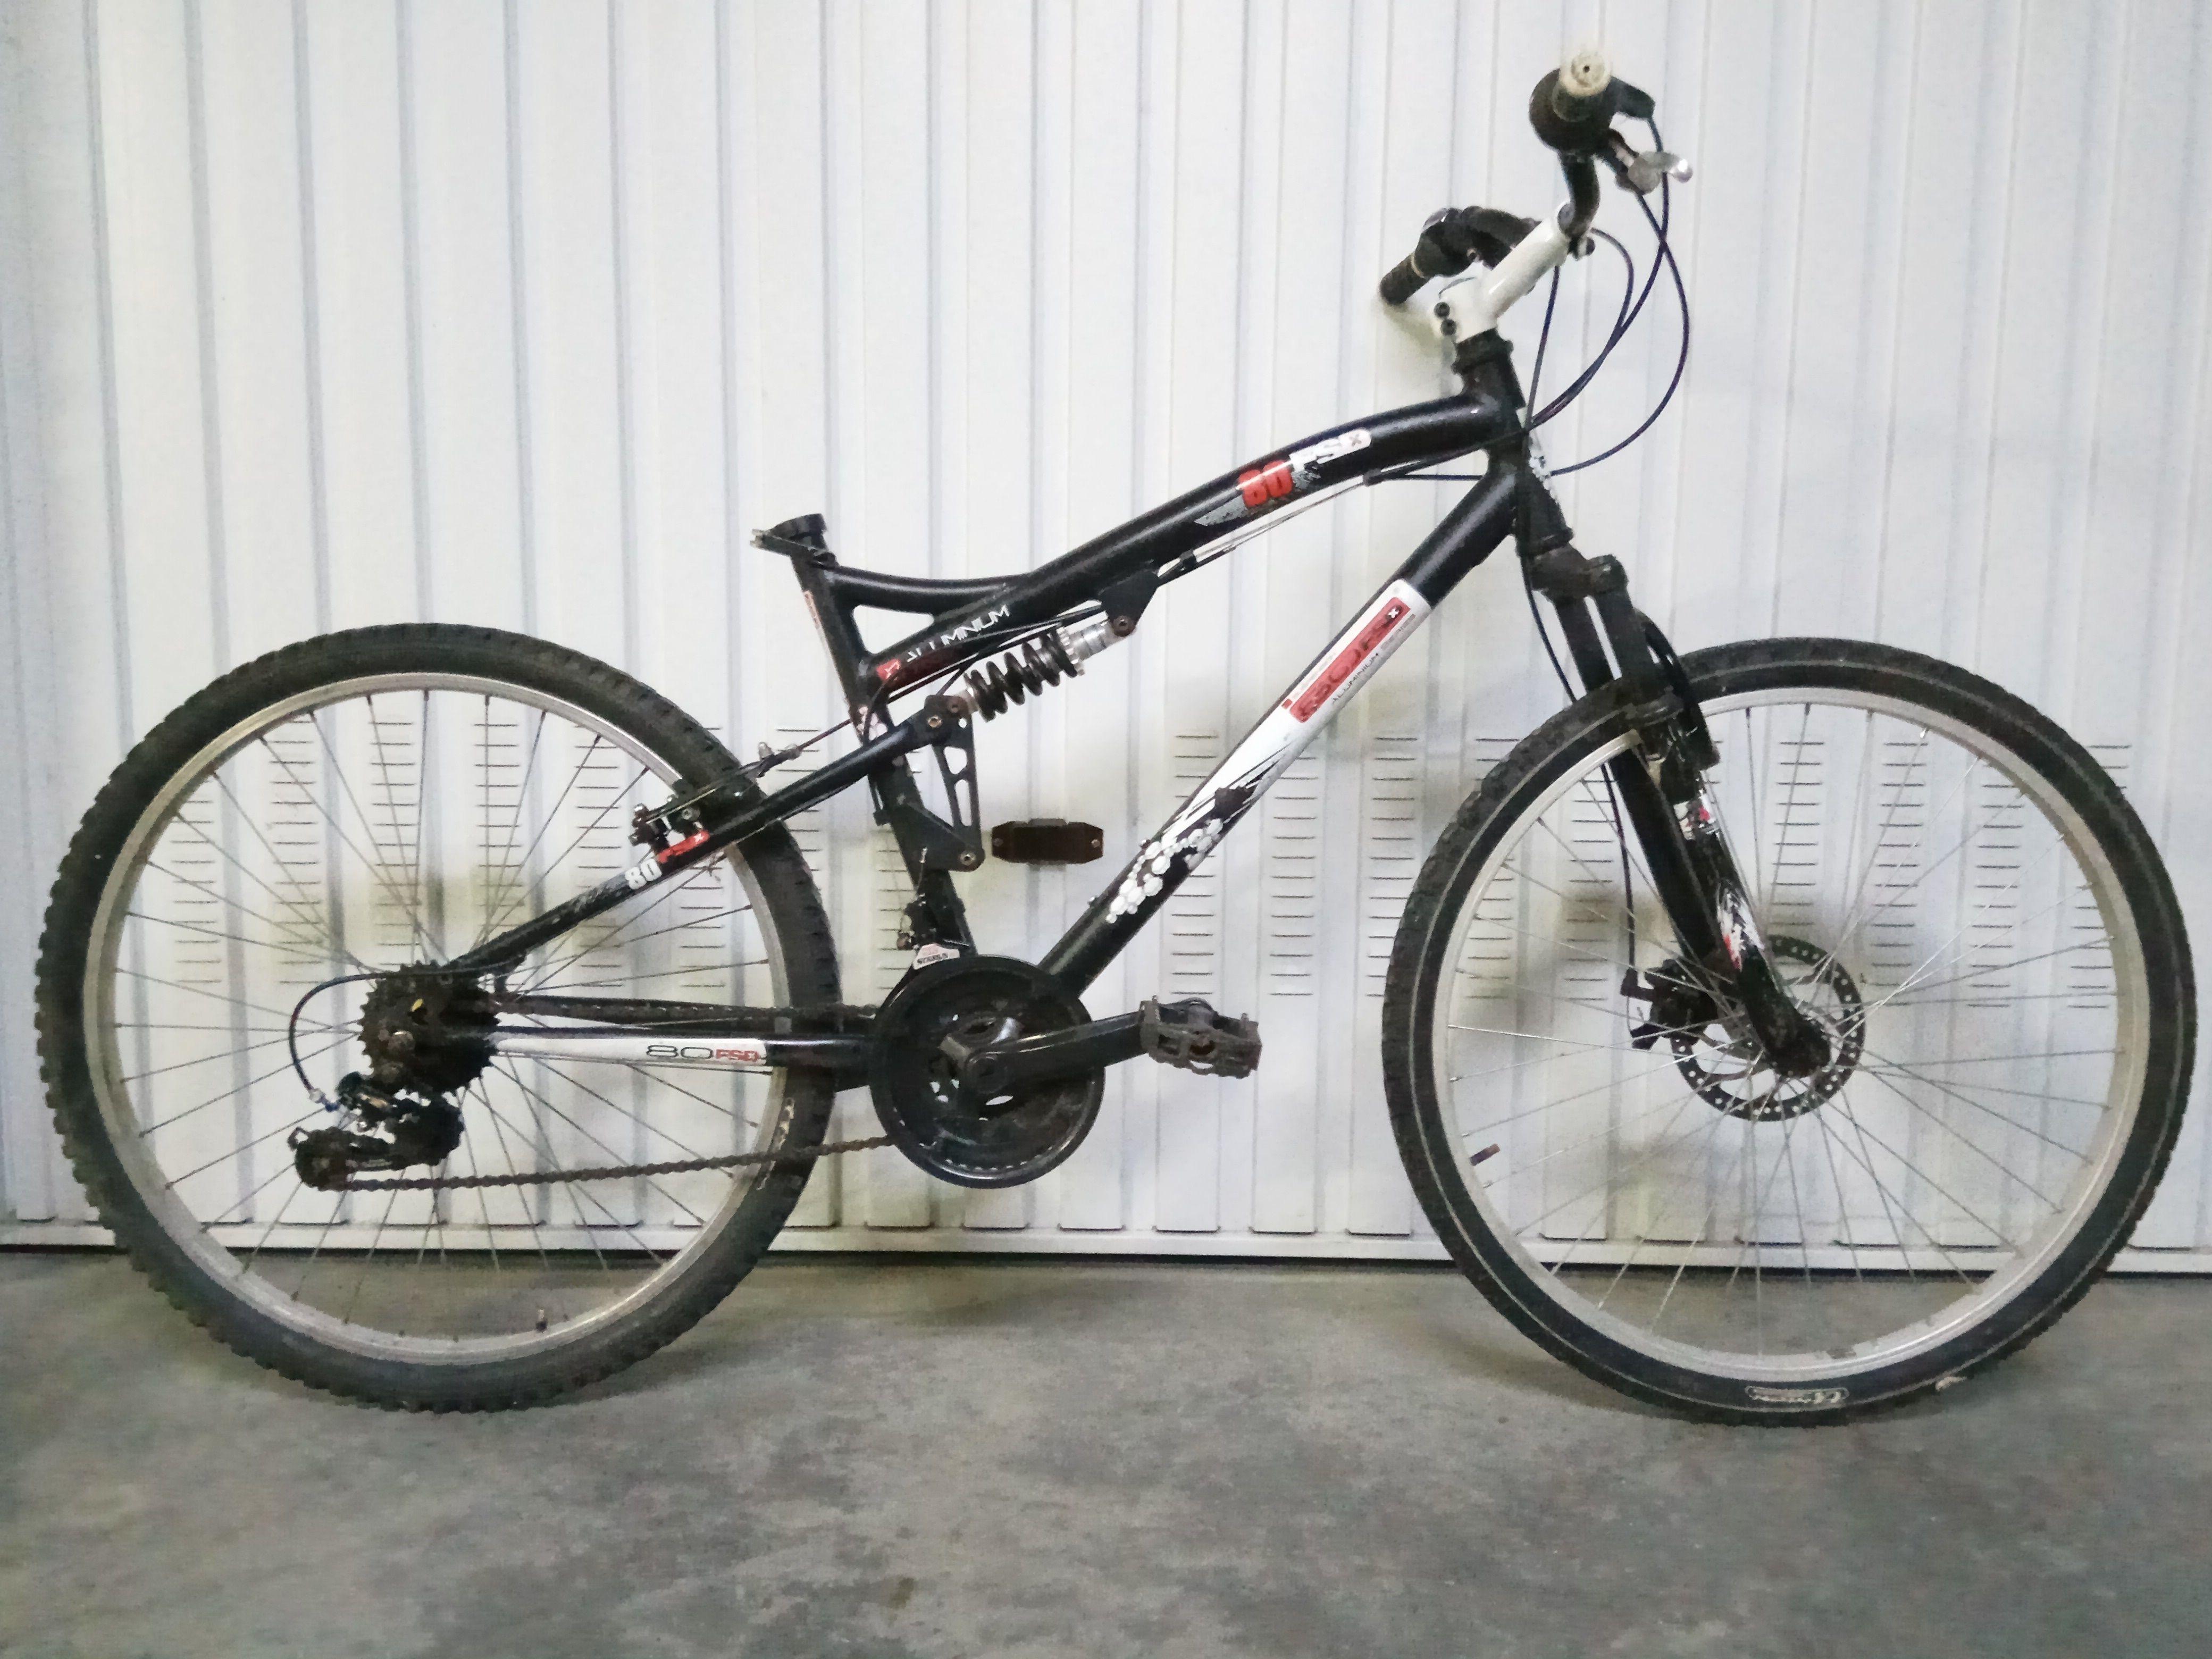 Bici Aluminio, Amortiguadores y Freno de Disco 90€ MARCA: 80Fsd ...